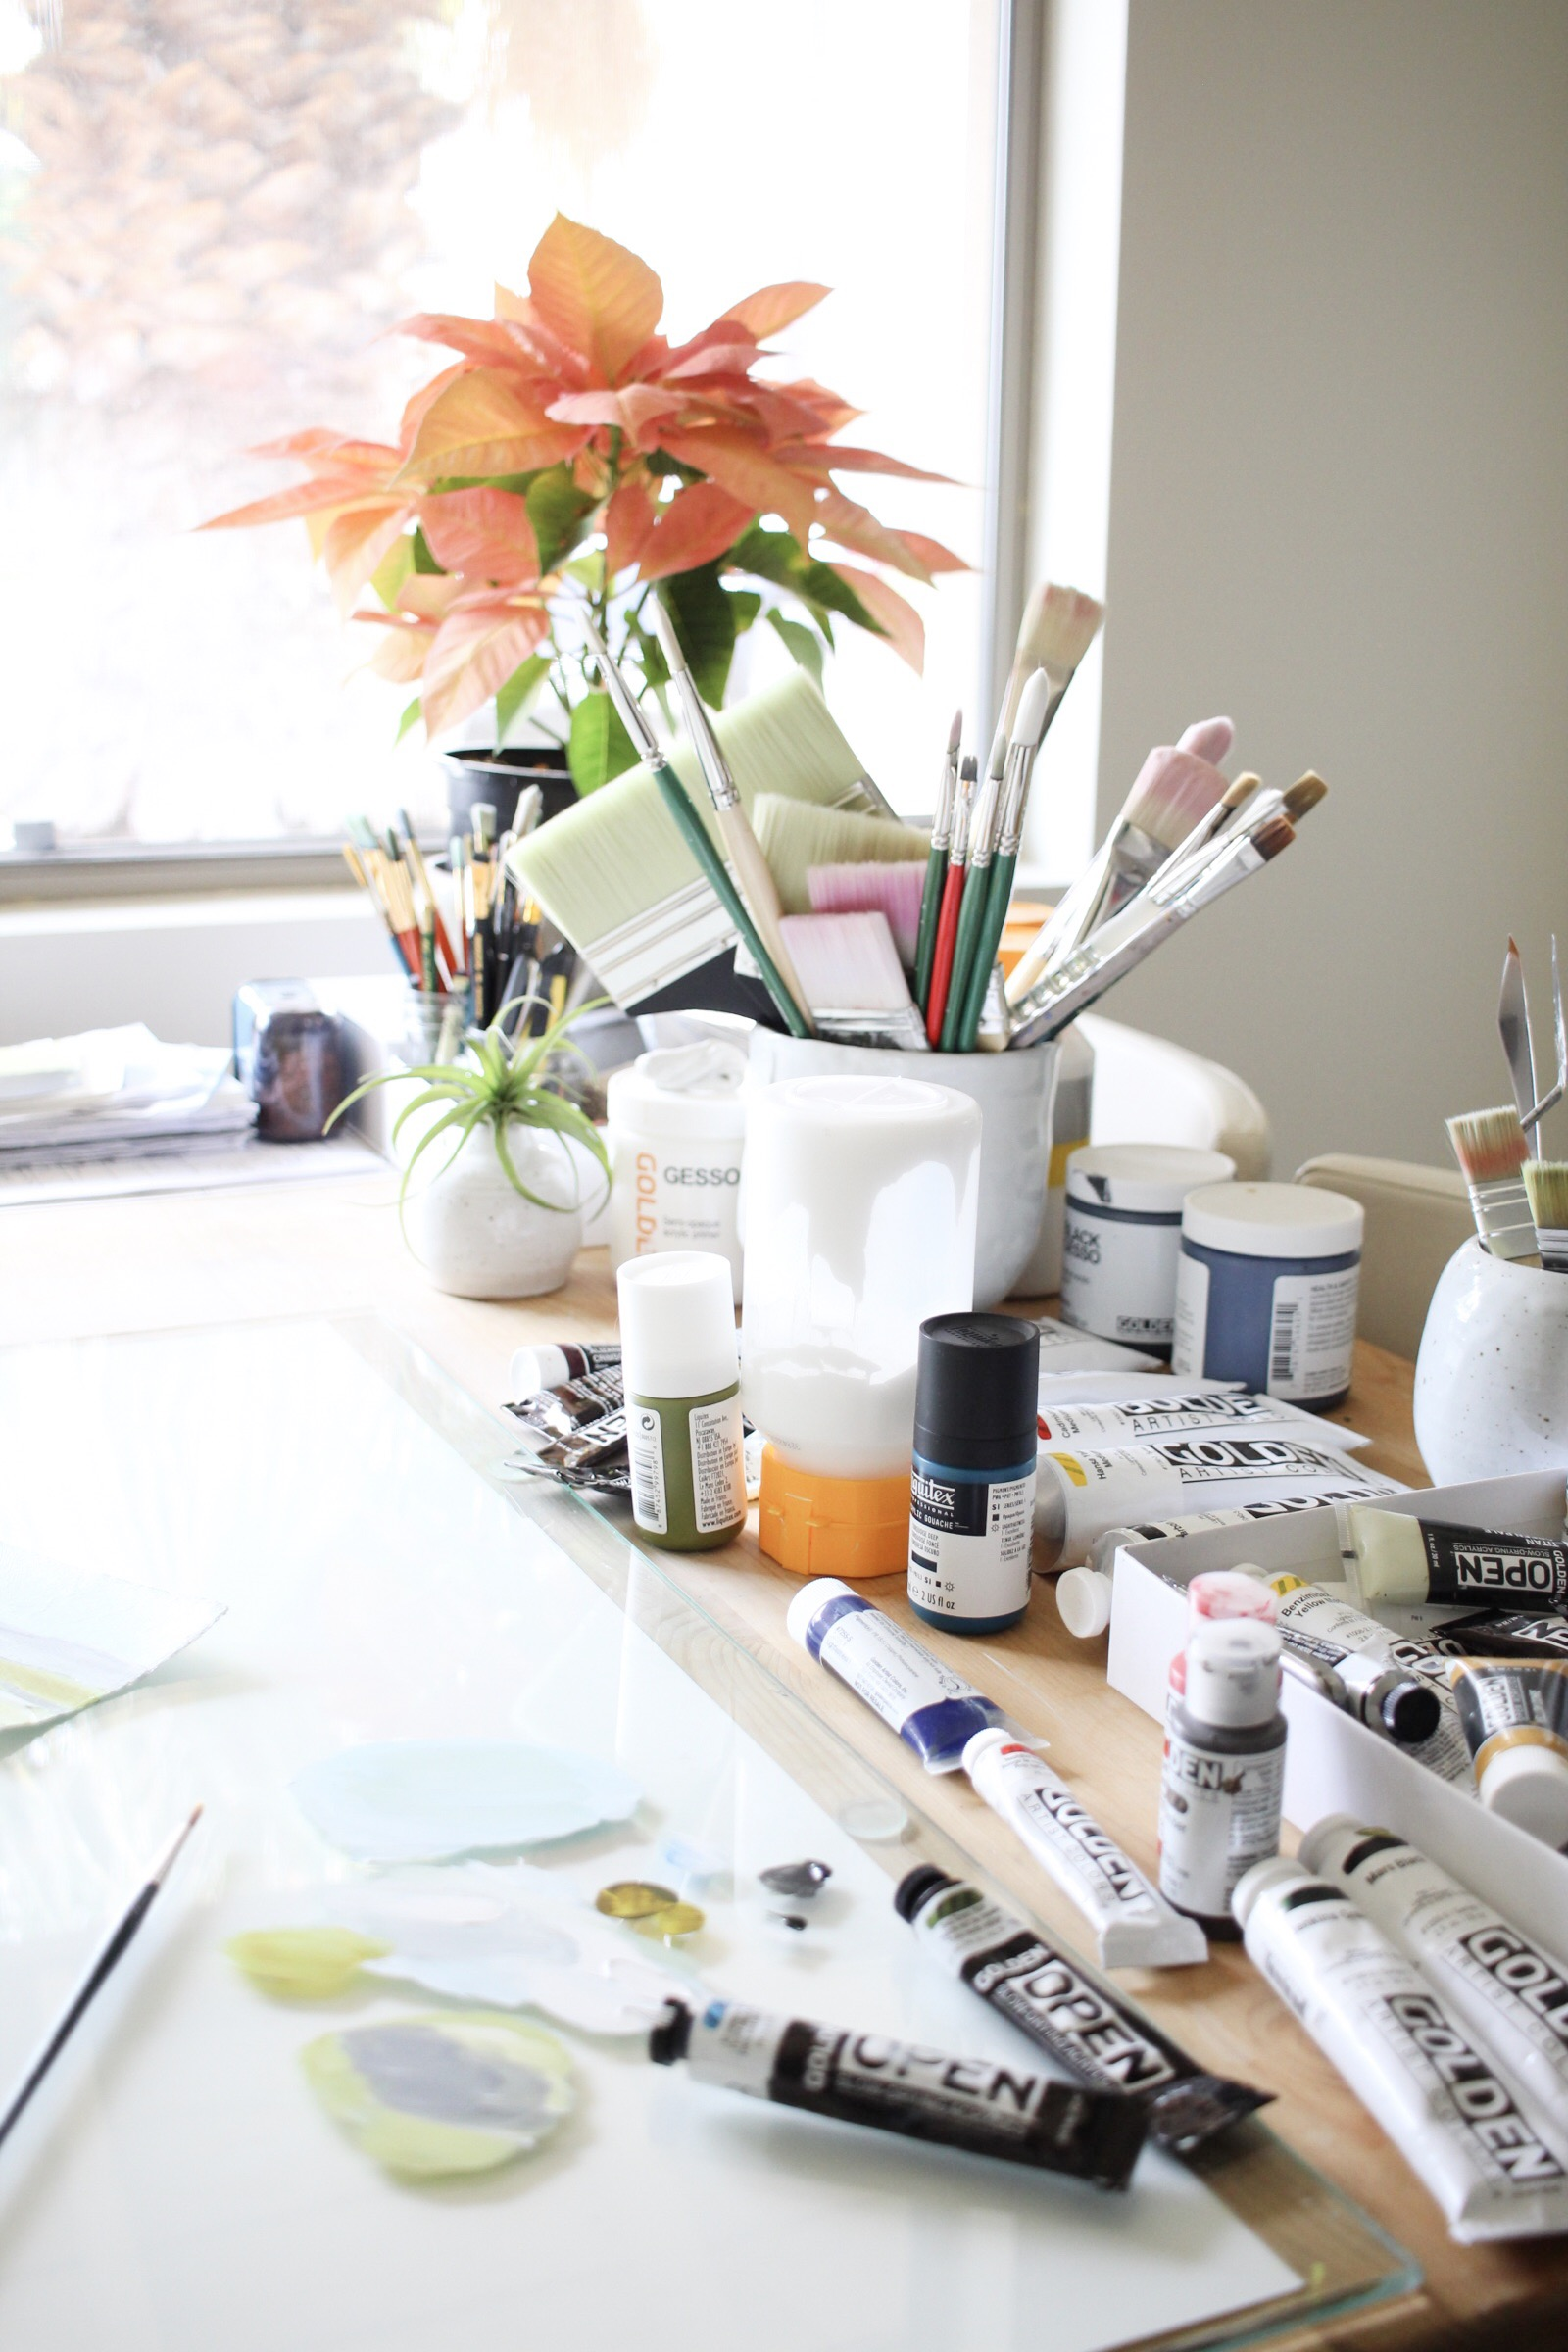 Where Makers Make_LaurieAnne Gonzalez_Art Studio Tour_6.jpg